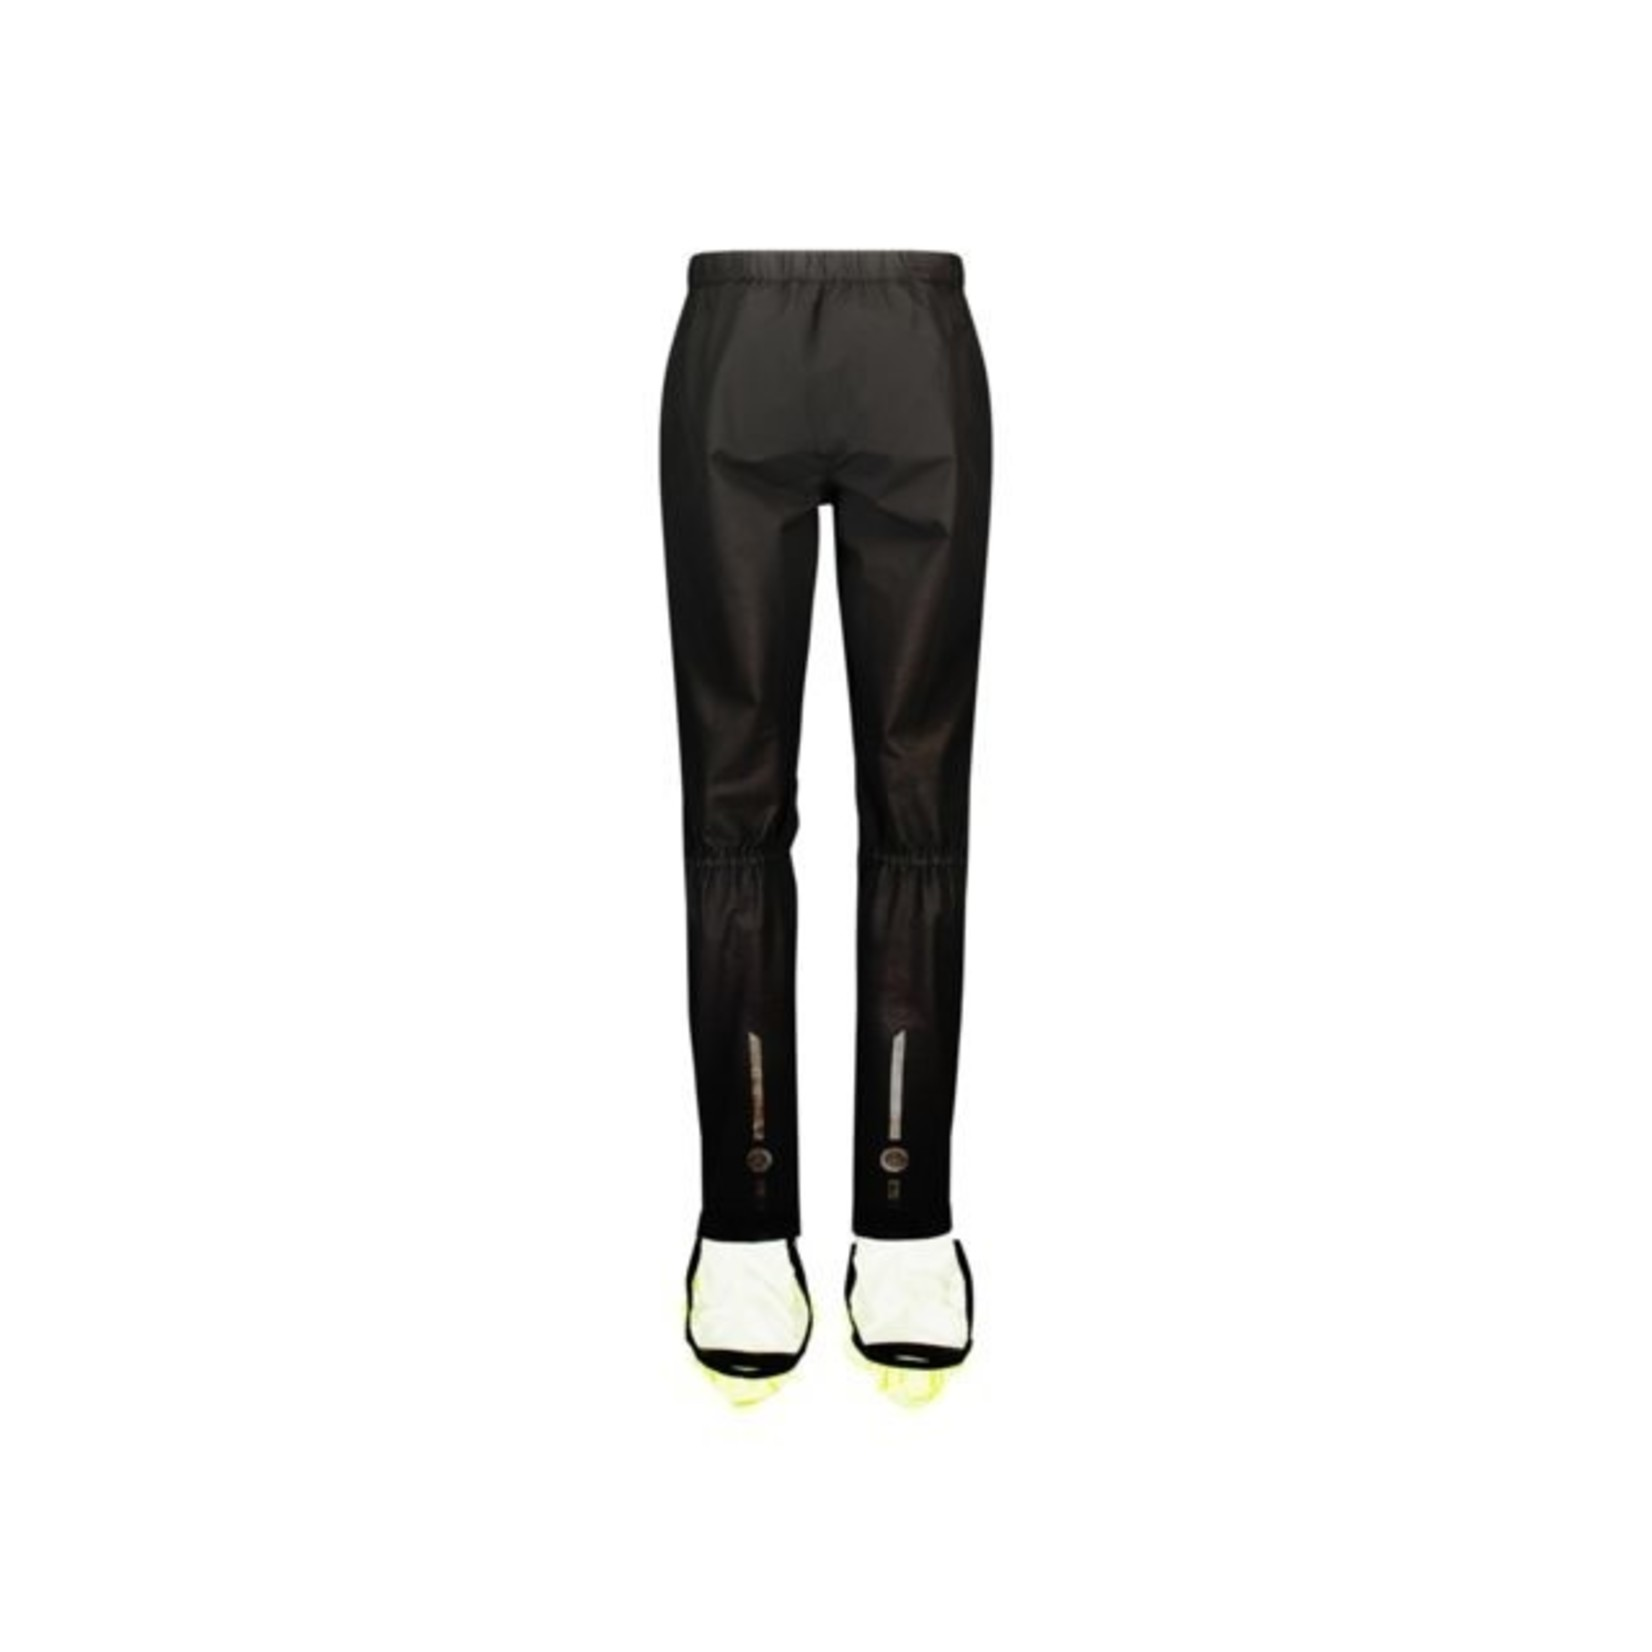 AGU AGU Commuter Compact pantalone Regen nera